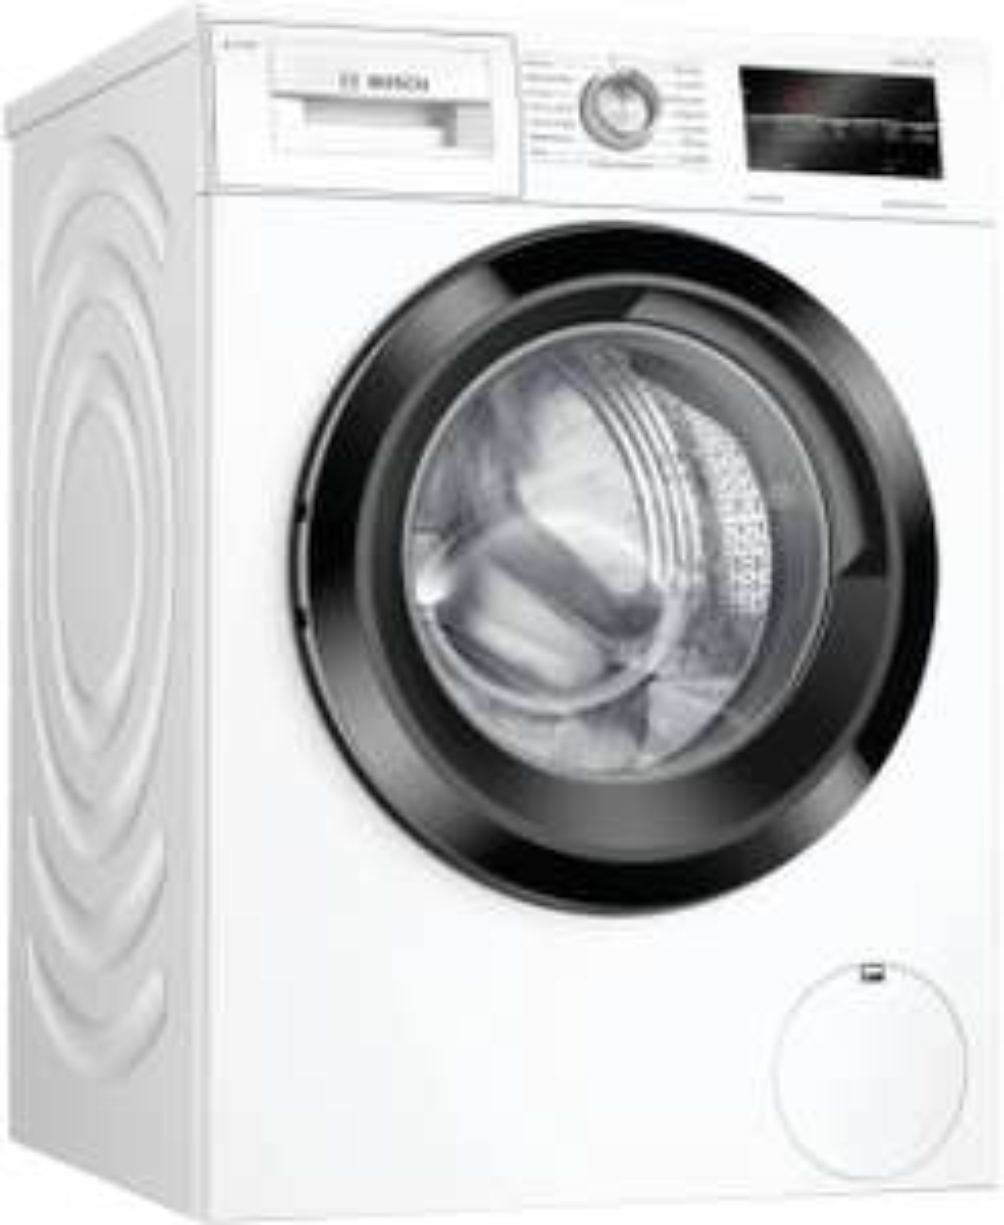 Bosch WAU 28 SIDOS Waschmaschine (9kg, 1400 U/Min., A+++/C, Nachlegefunktion, AquaStop) + 5 Flaschen Persil Green Power (je 2,5L) gratis